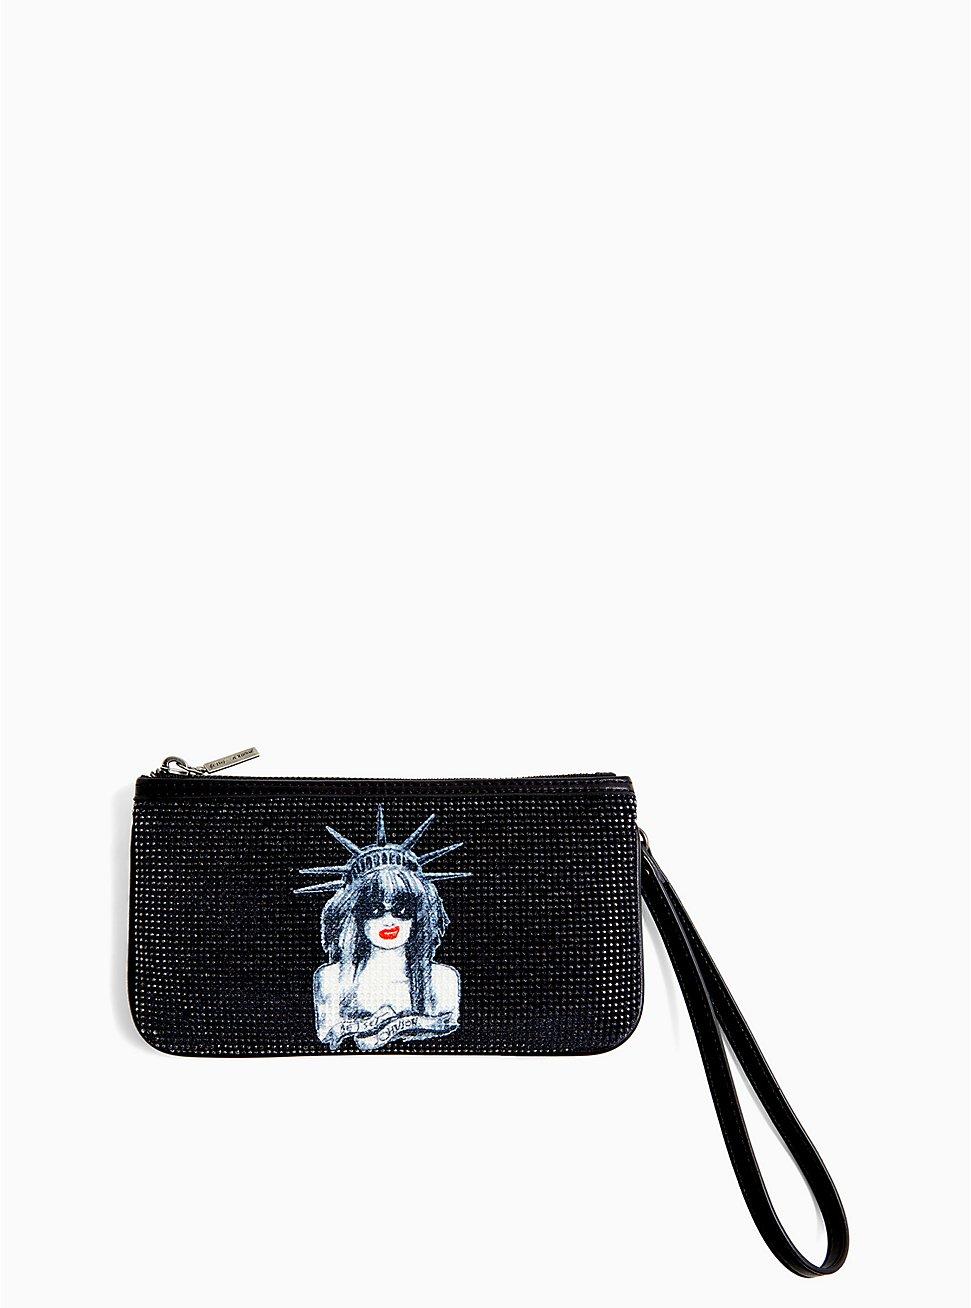 Betsey Johnson Black Faux Leather Sparkle Convertible Bag, , hi-res